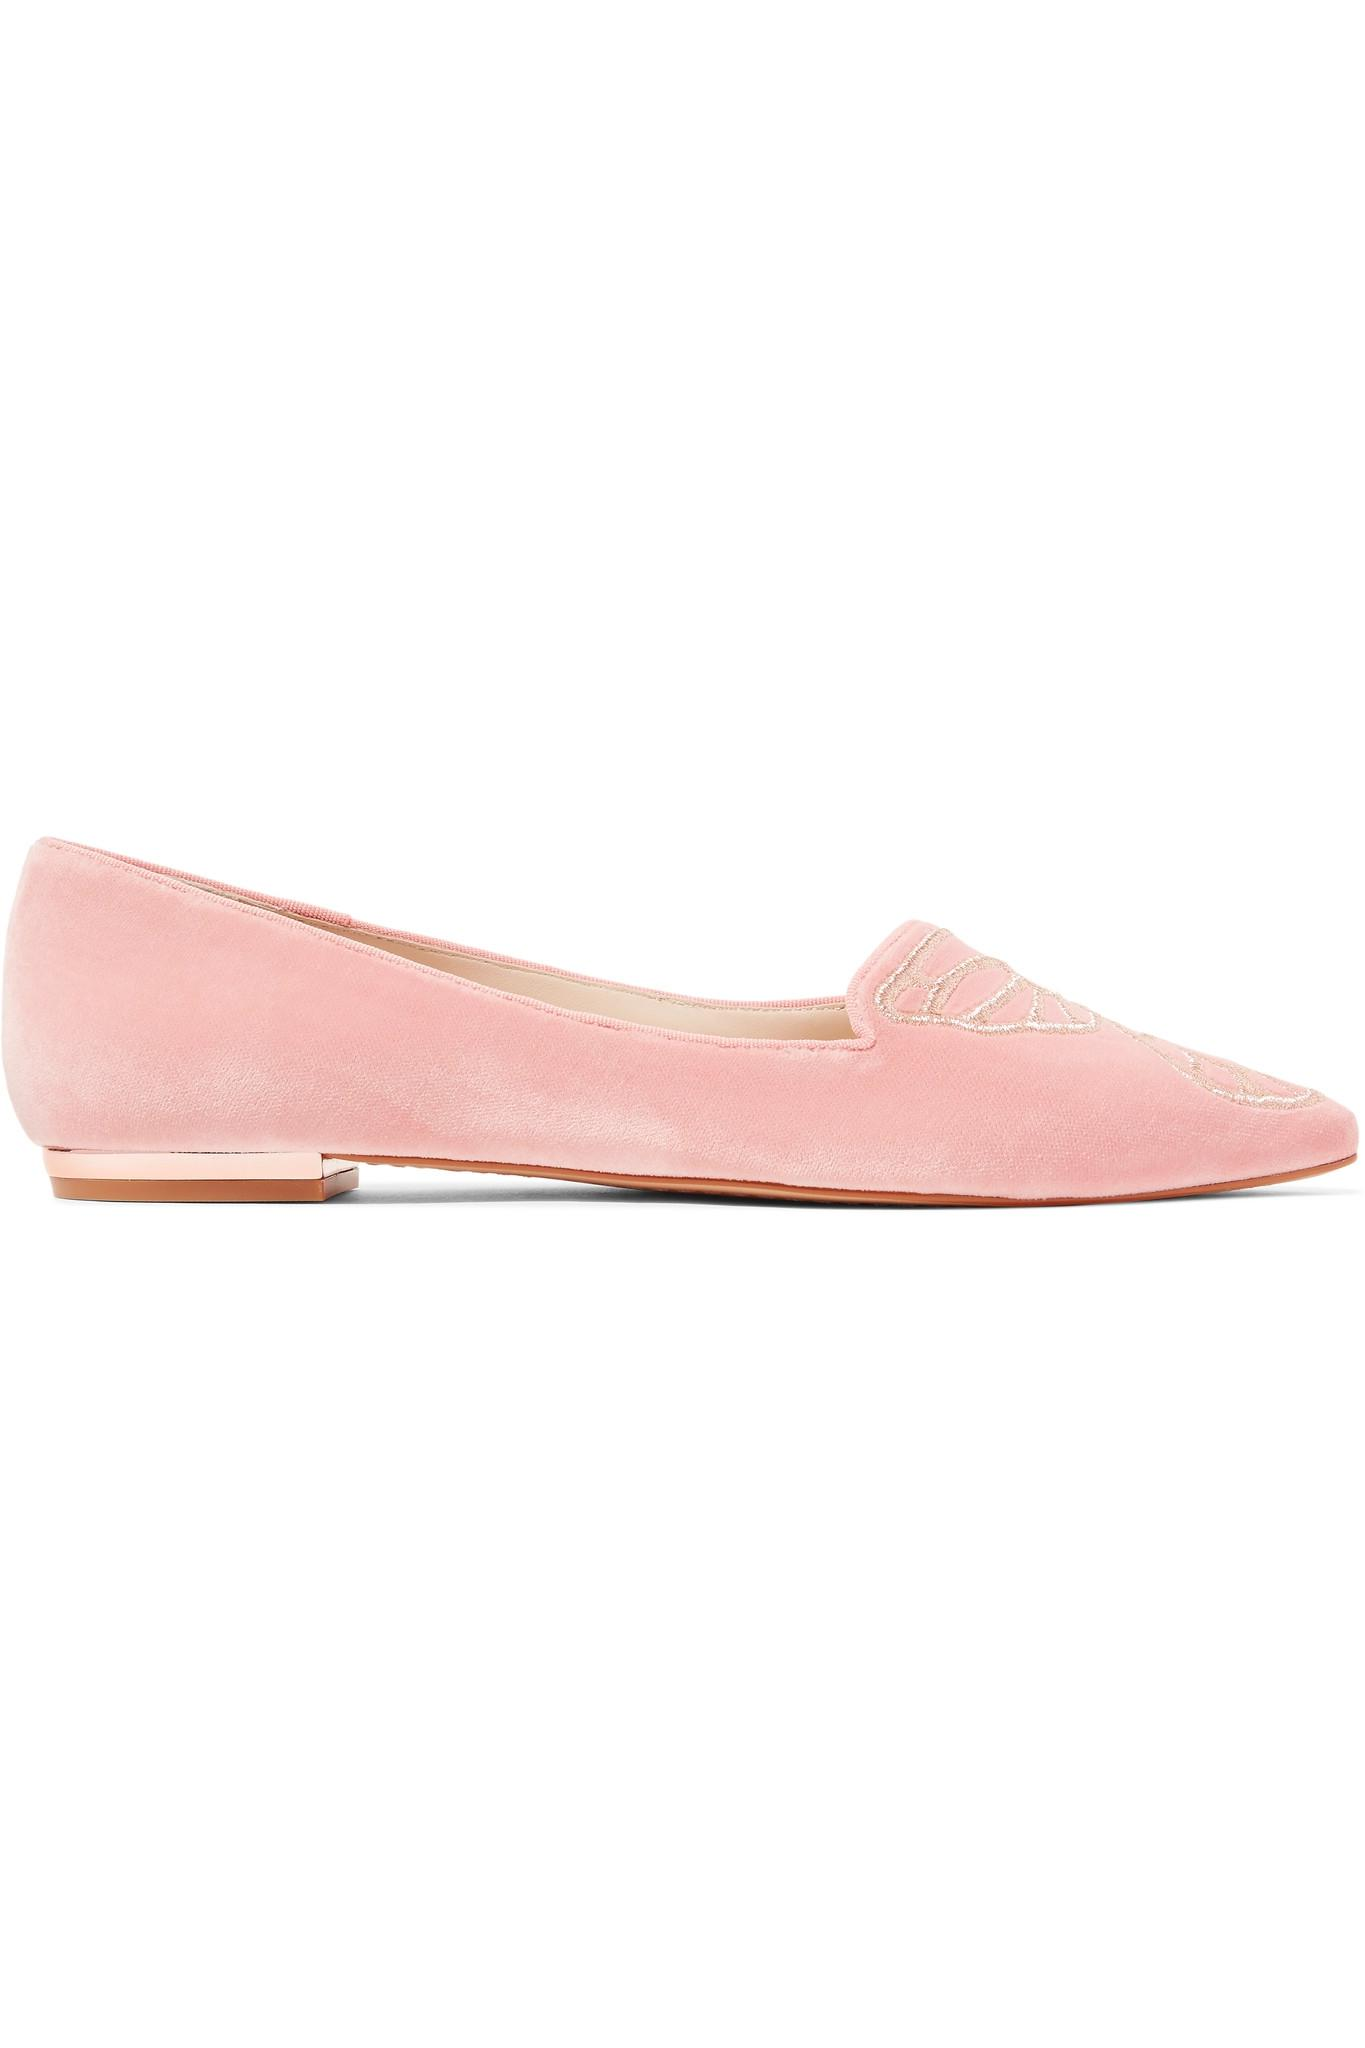 Chaussures plates en daim Bibi ButterflySophia Webster 70D1p